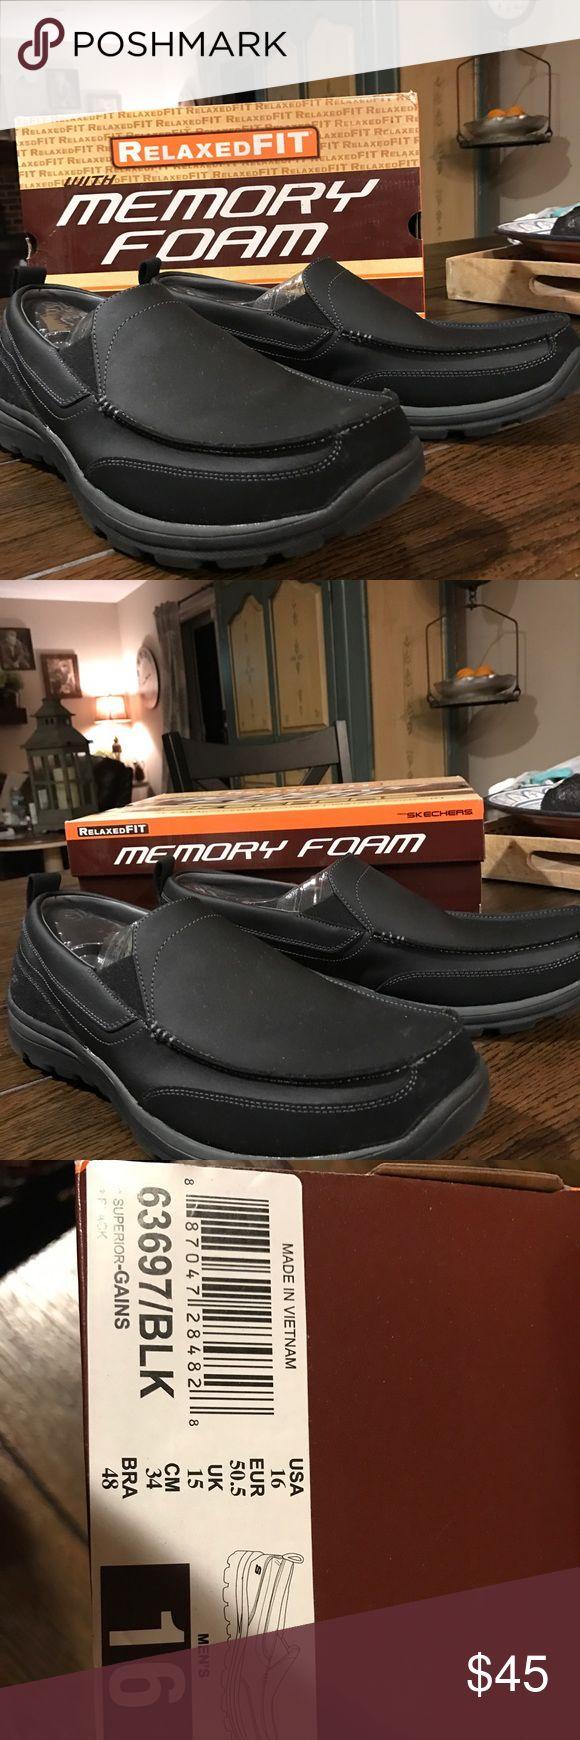 Men's Skechers Shoes Brand New, never worn. Black, men's size 16 Skechers Shoes Flats & Loafers